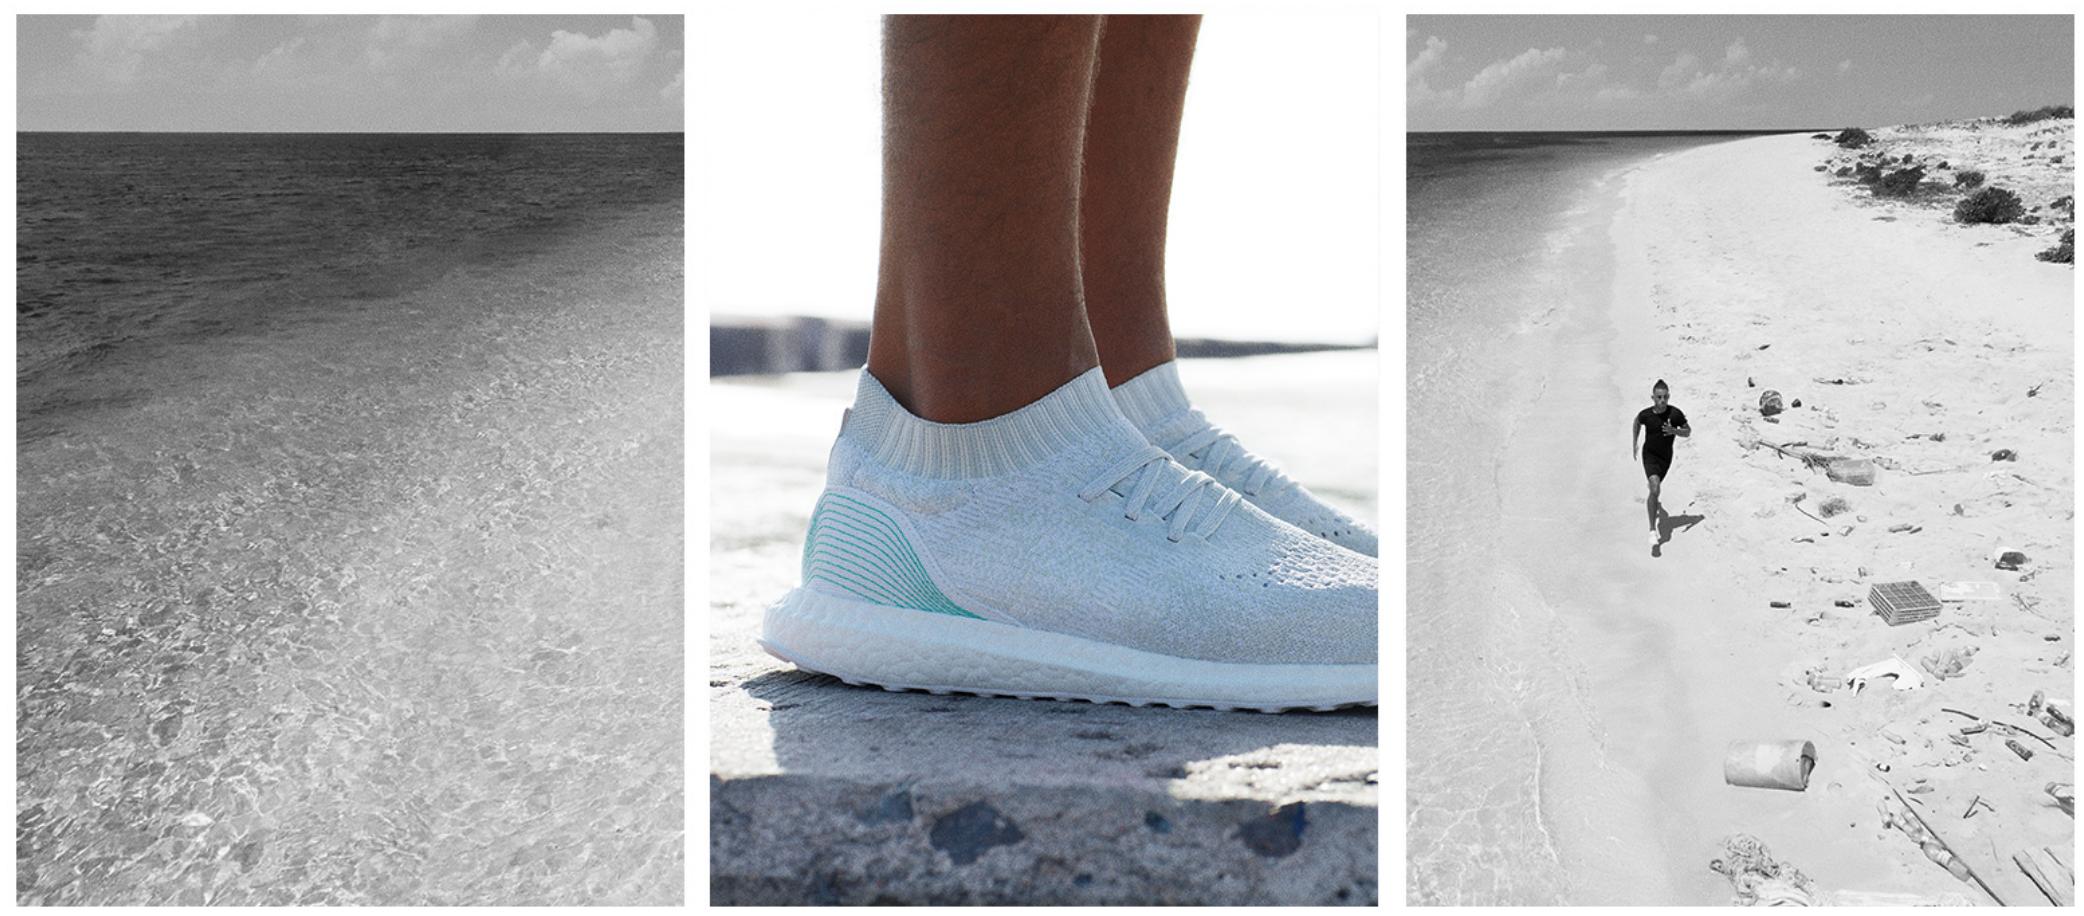 UltraBOOST Parley Der adidas Sneaker Uncaged Meeresabfall E2WD9HI